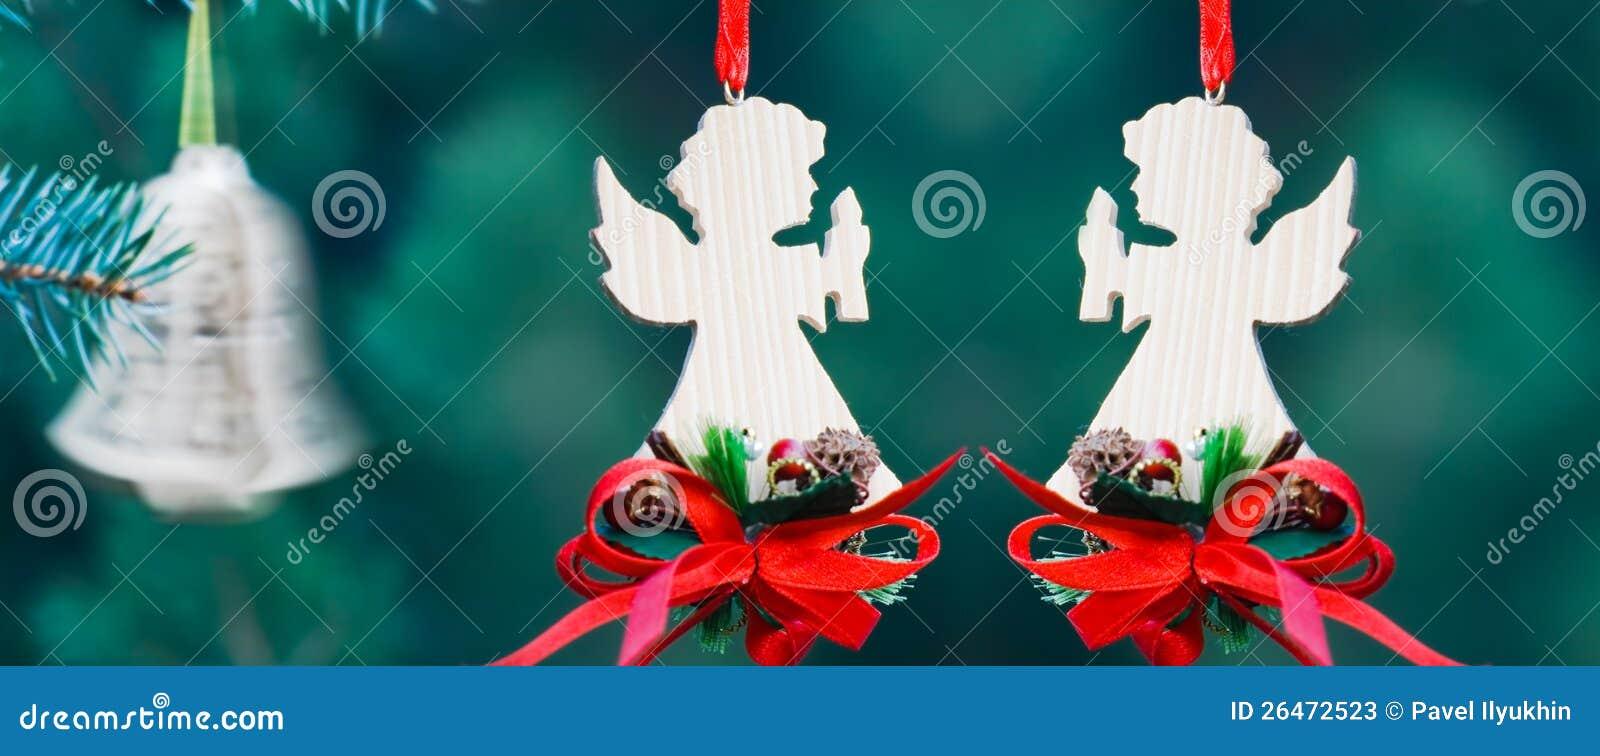 christmas decoration of handmade angels - Handmade Angels Christmas Decorations